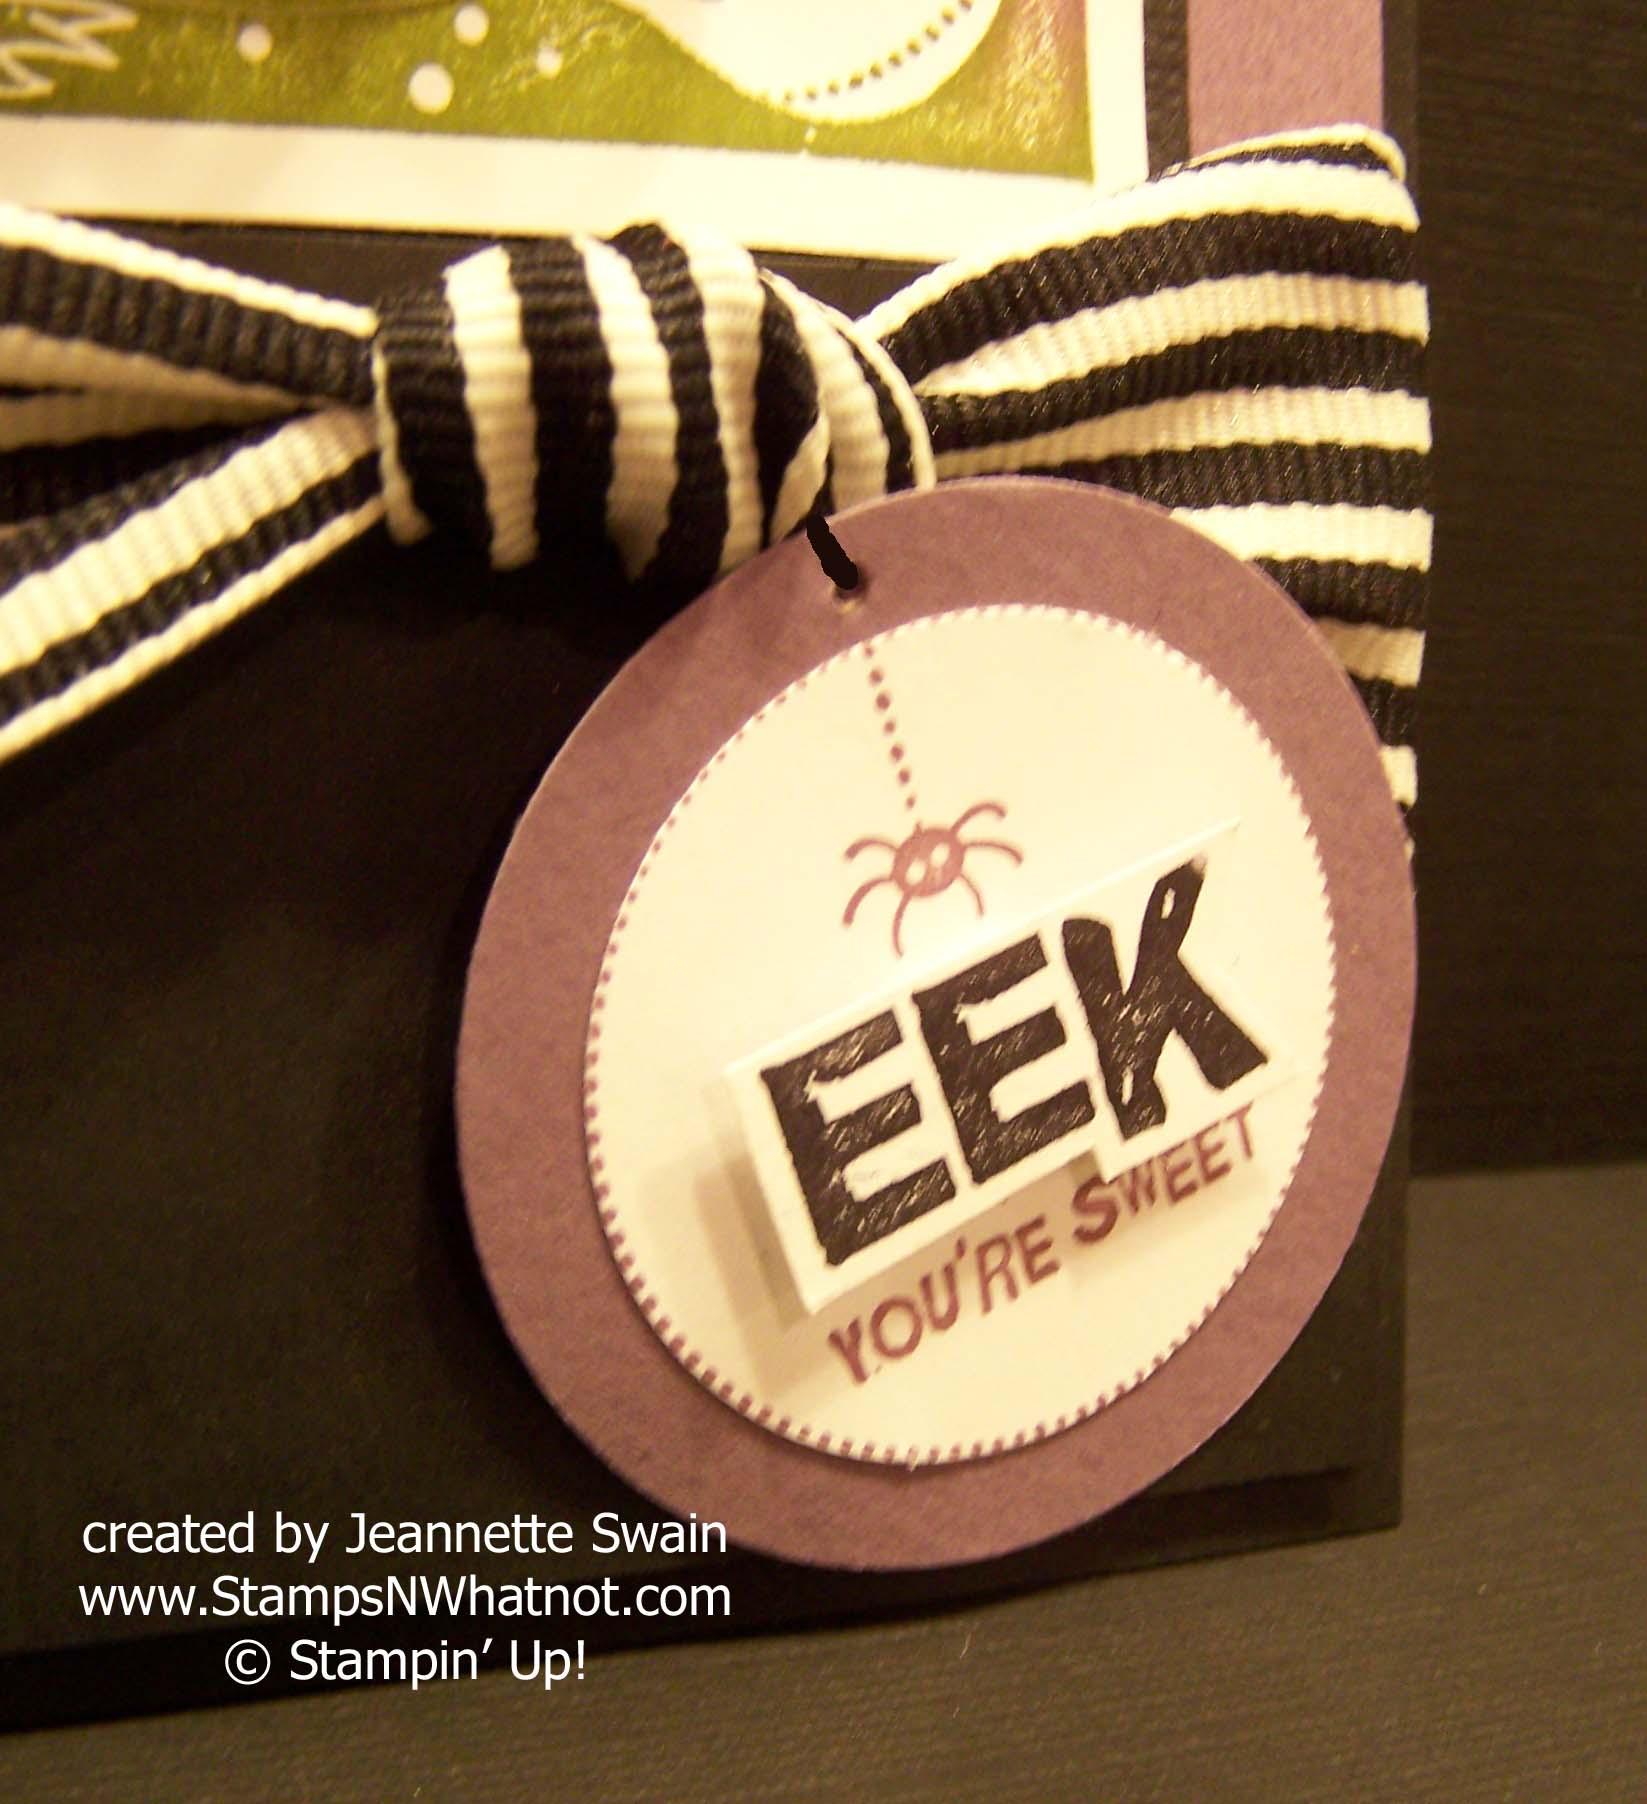 Eek Closeup